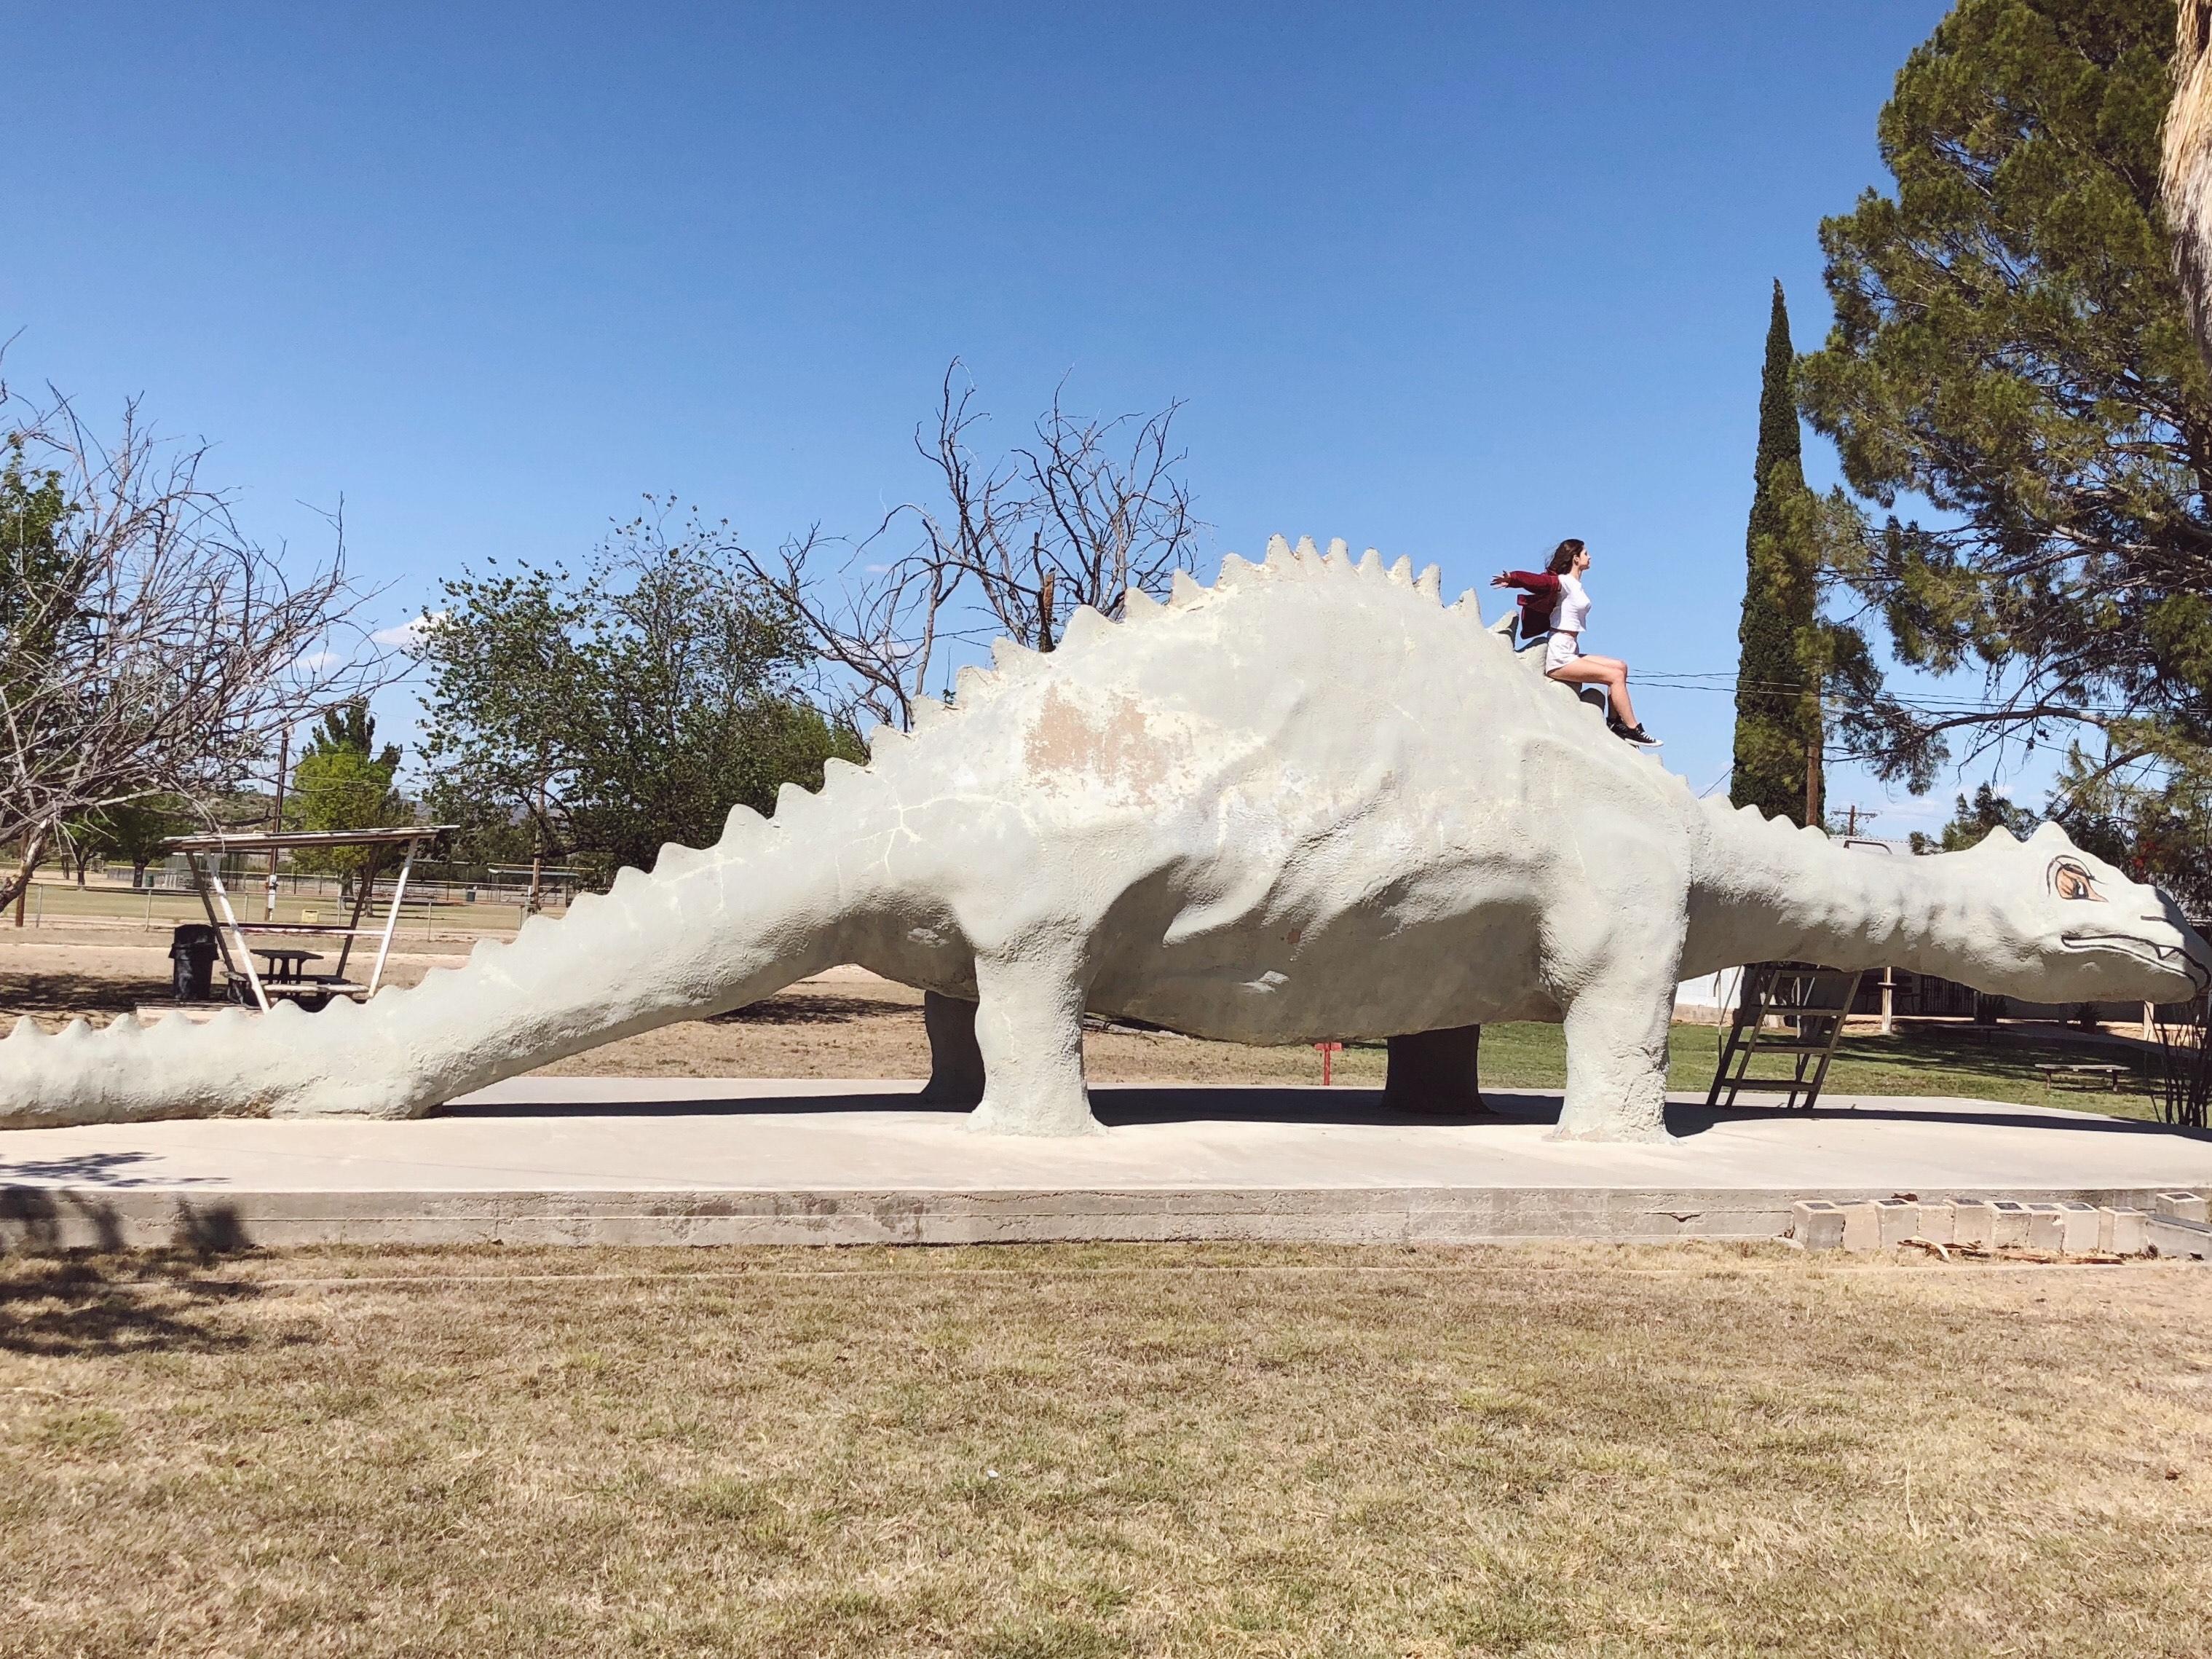 Roadside attraction Dinosaur at Alley Oop Park, Texas